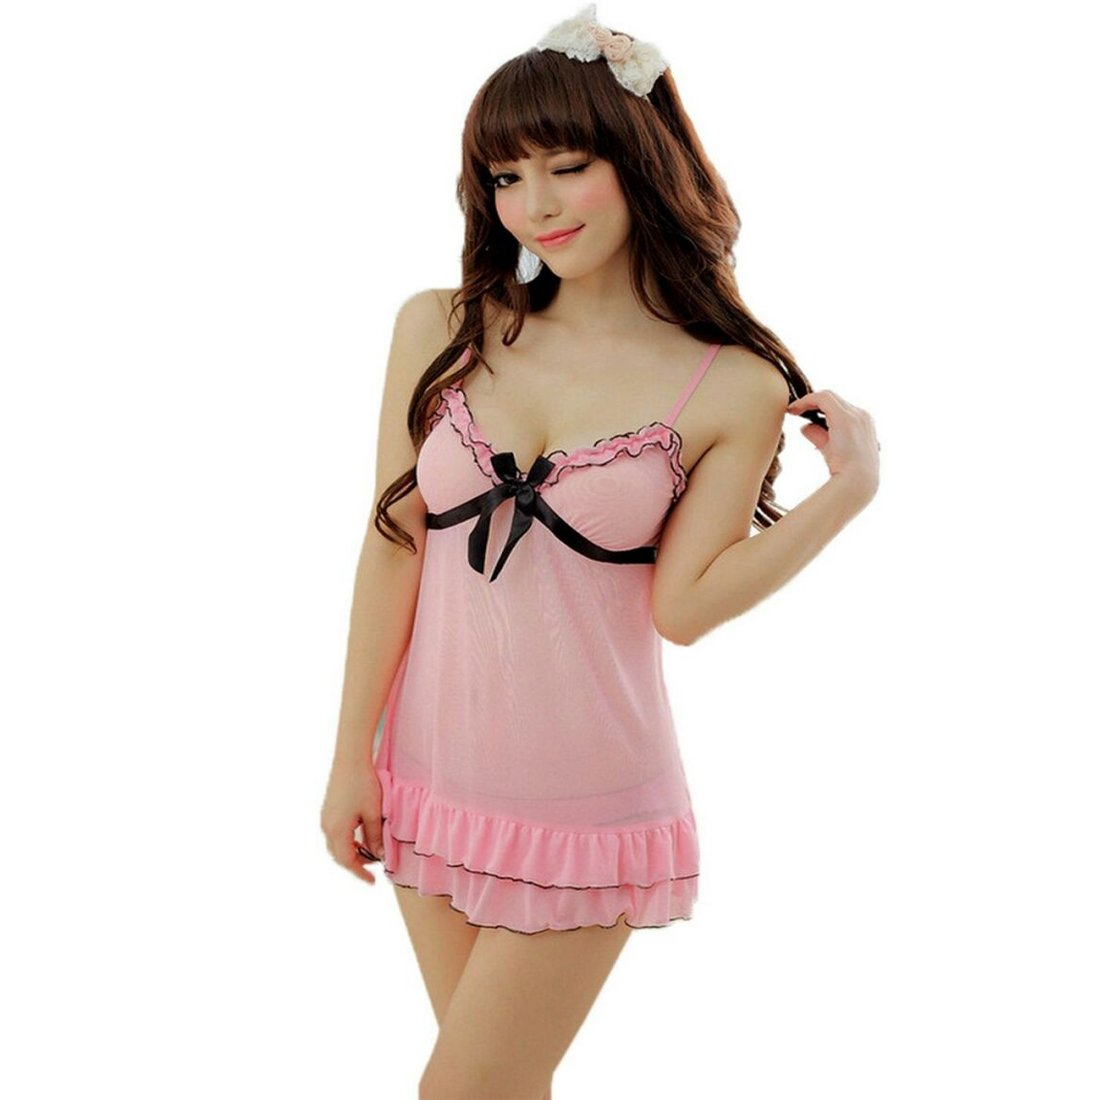 Buy Waooo Baby Doll Lingerie Night Dresses Lacy Robe Set Teddy